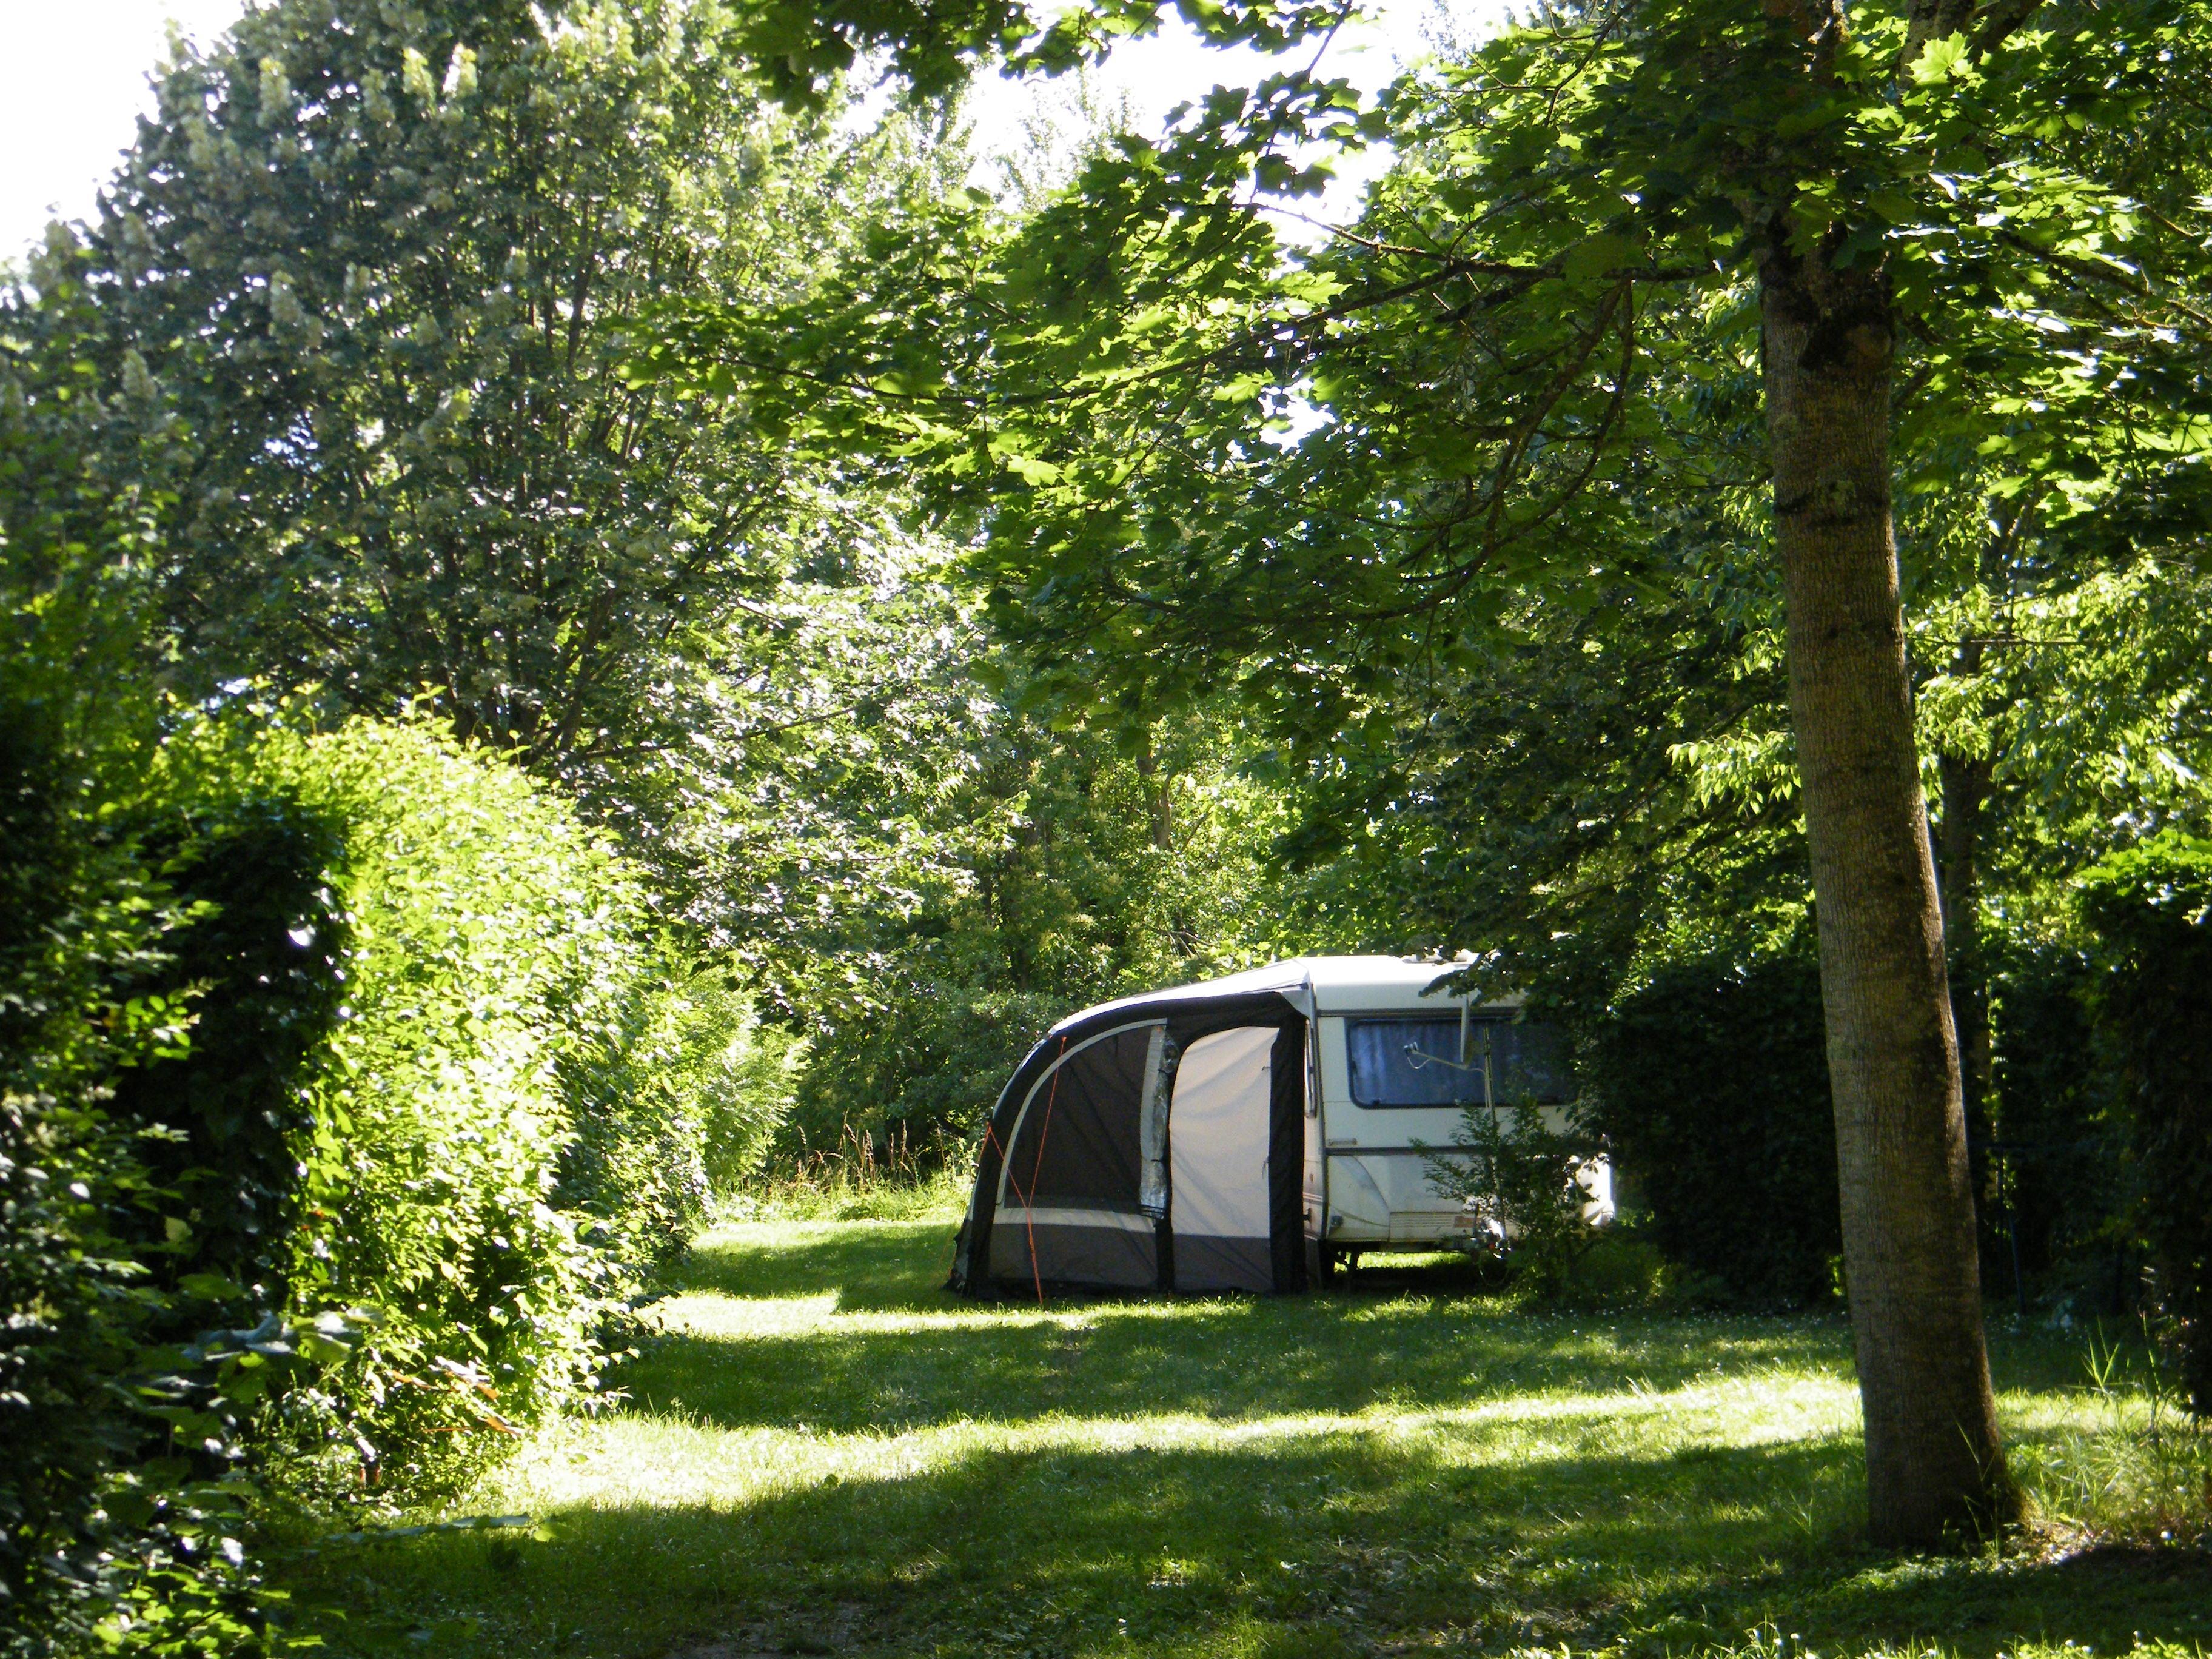 Emplacement - Emplacement Camping - Camping Municipal de l'Île de Bidounet